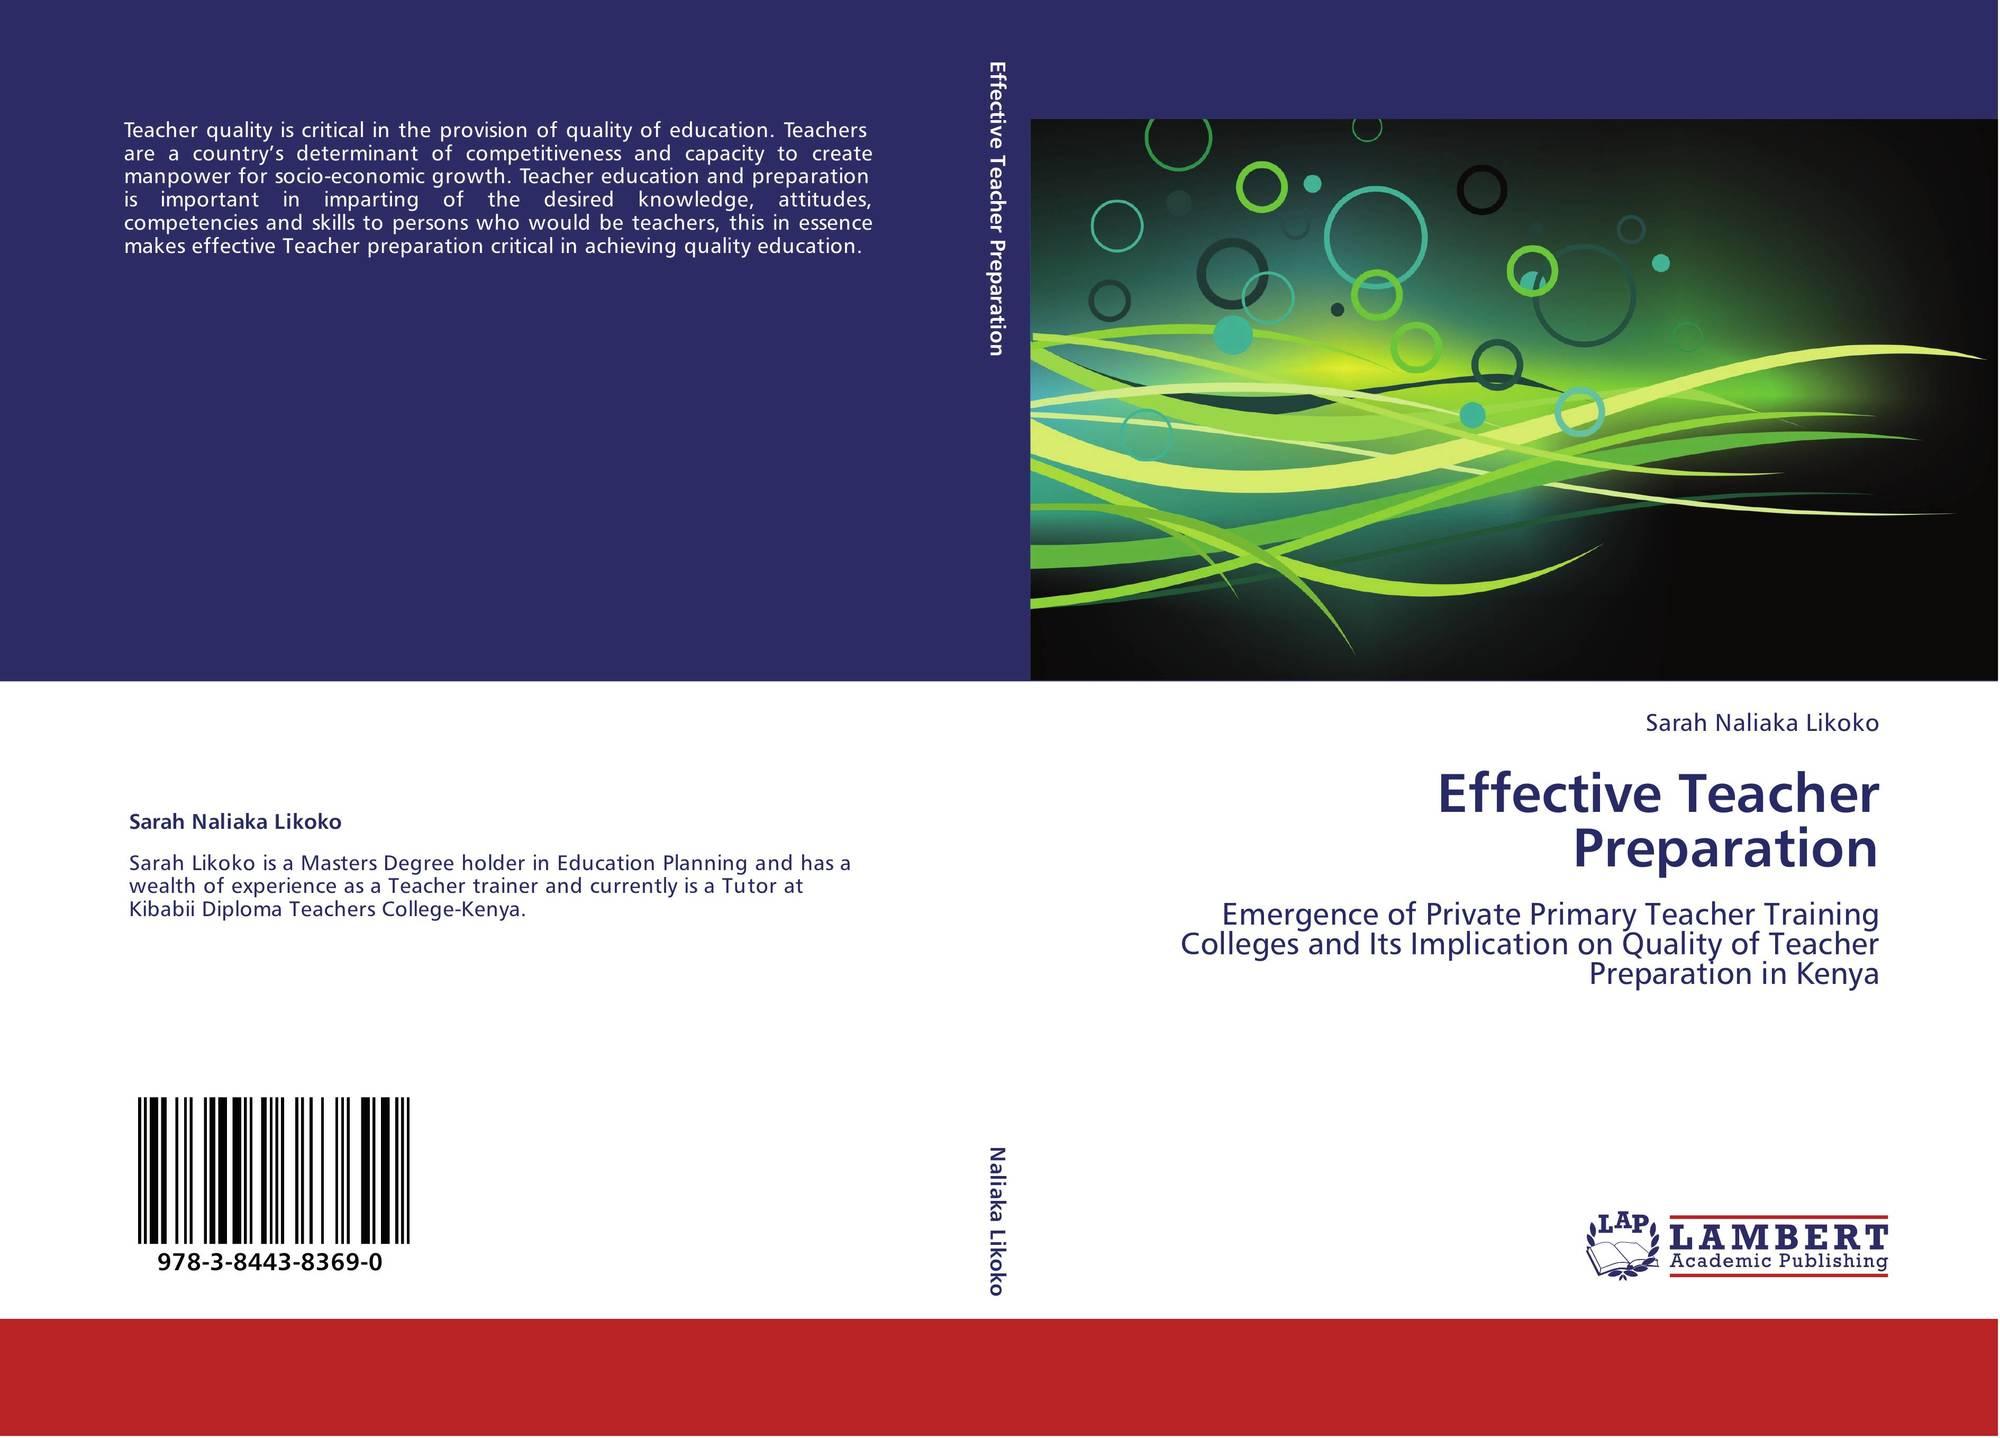 Effective Teacher Preparation, 978-3-8443-8369-0, 3844383697